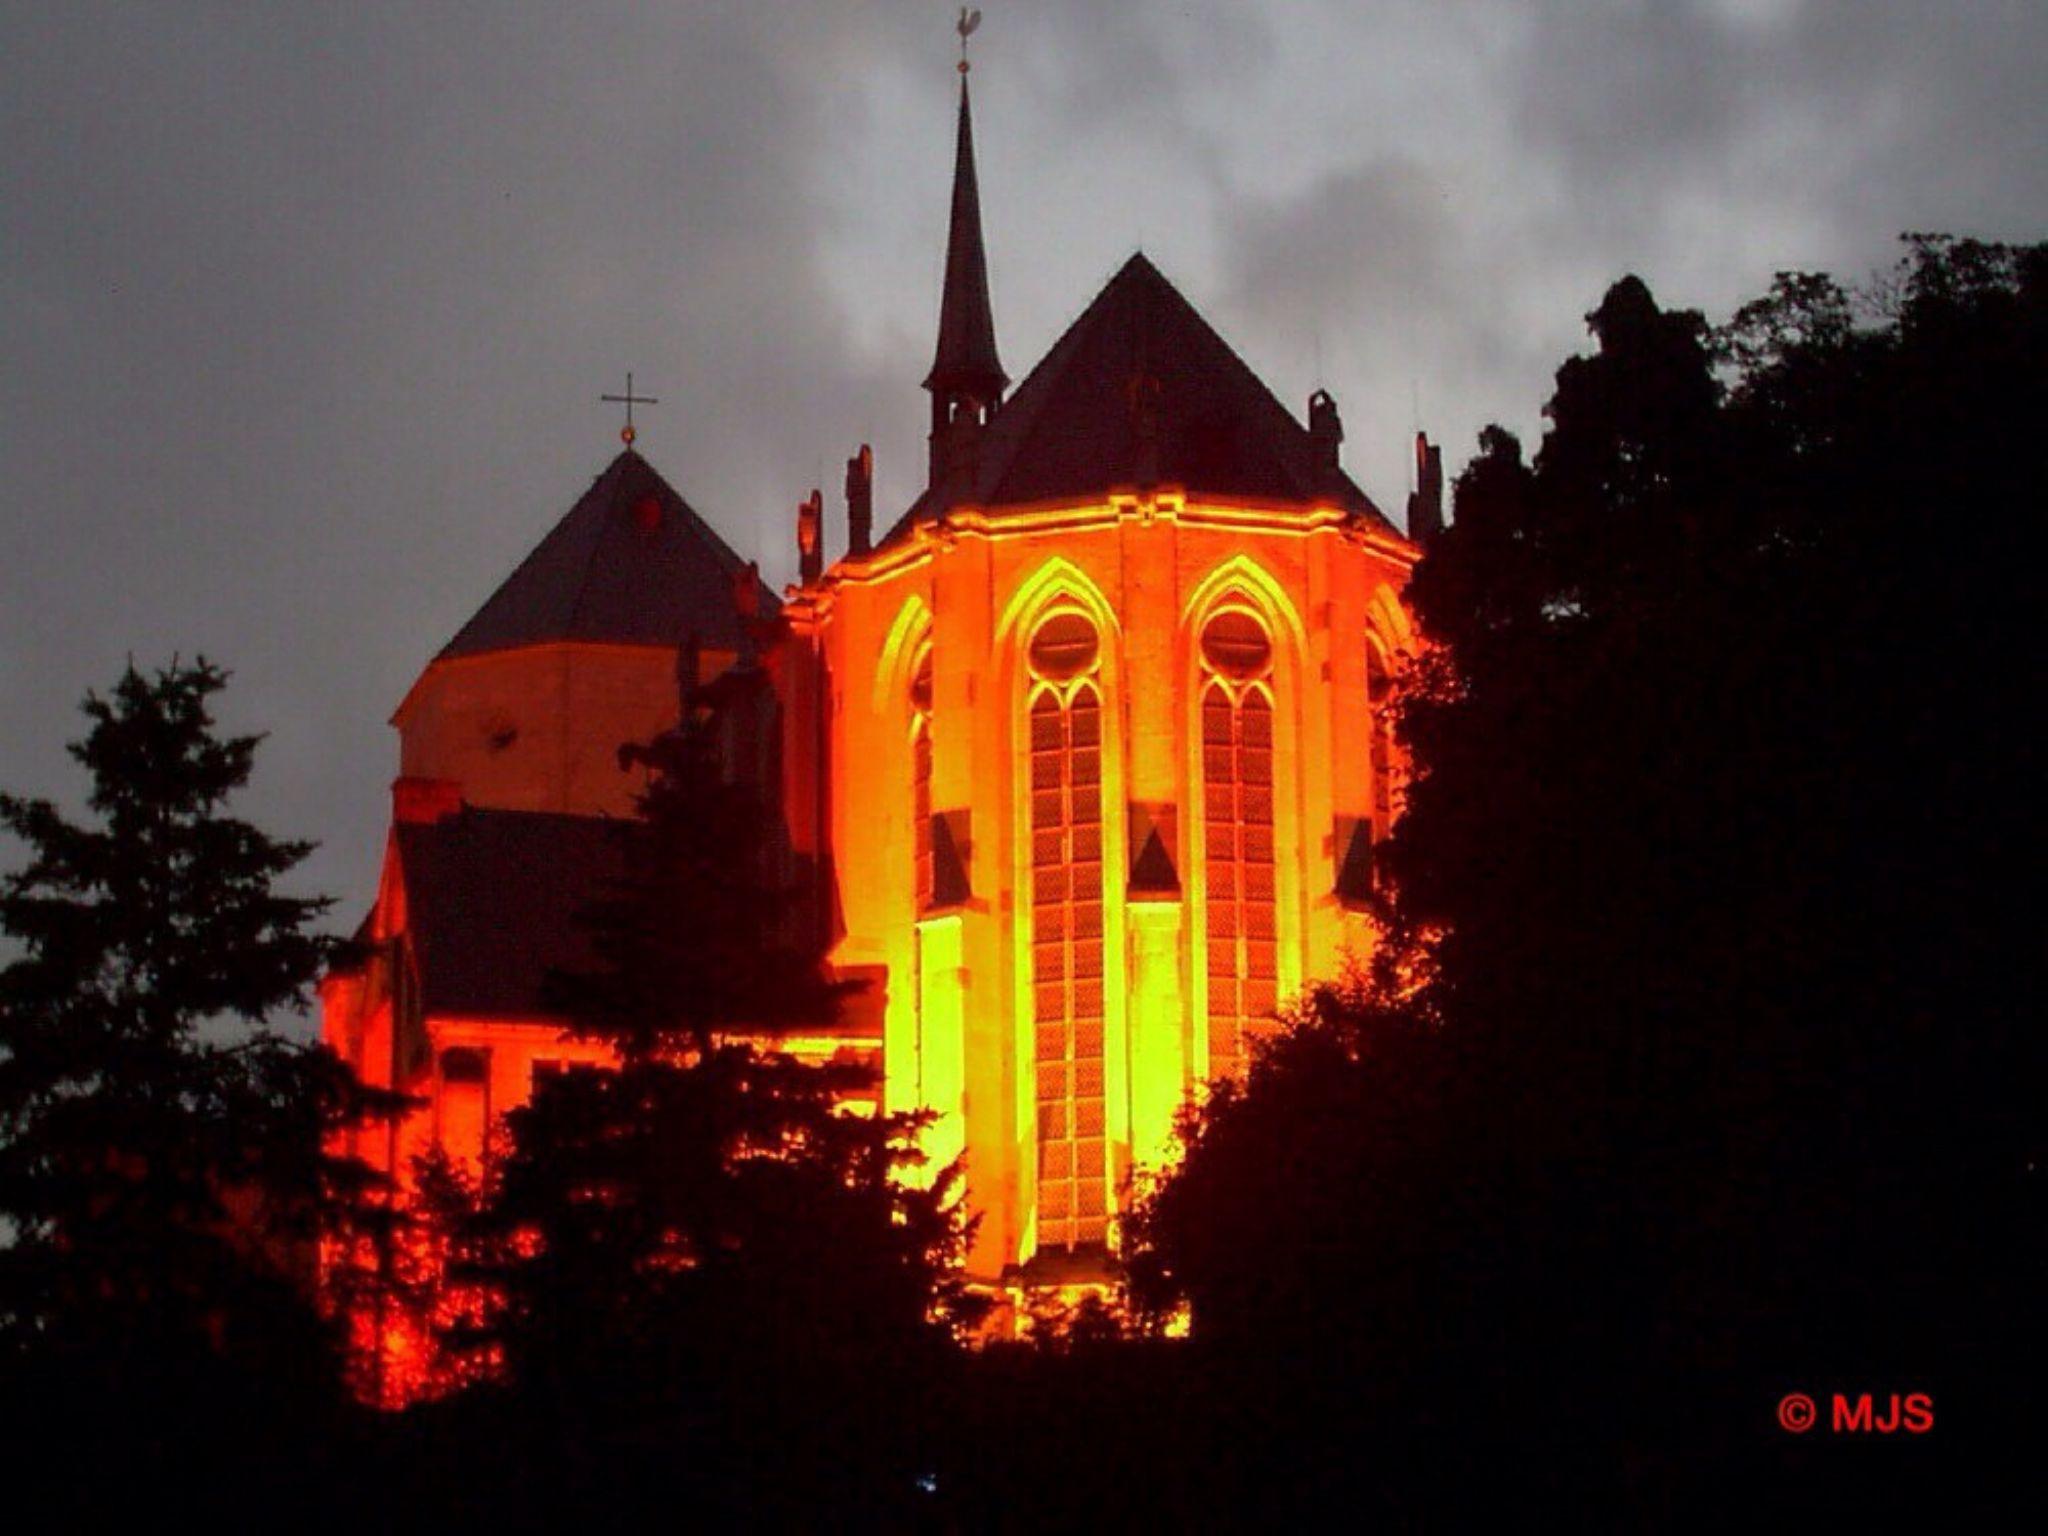 Church in the Night  by MJSMarcJoern